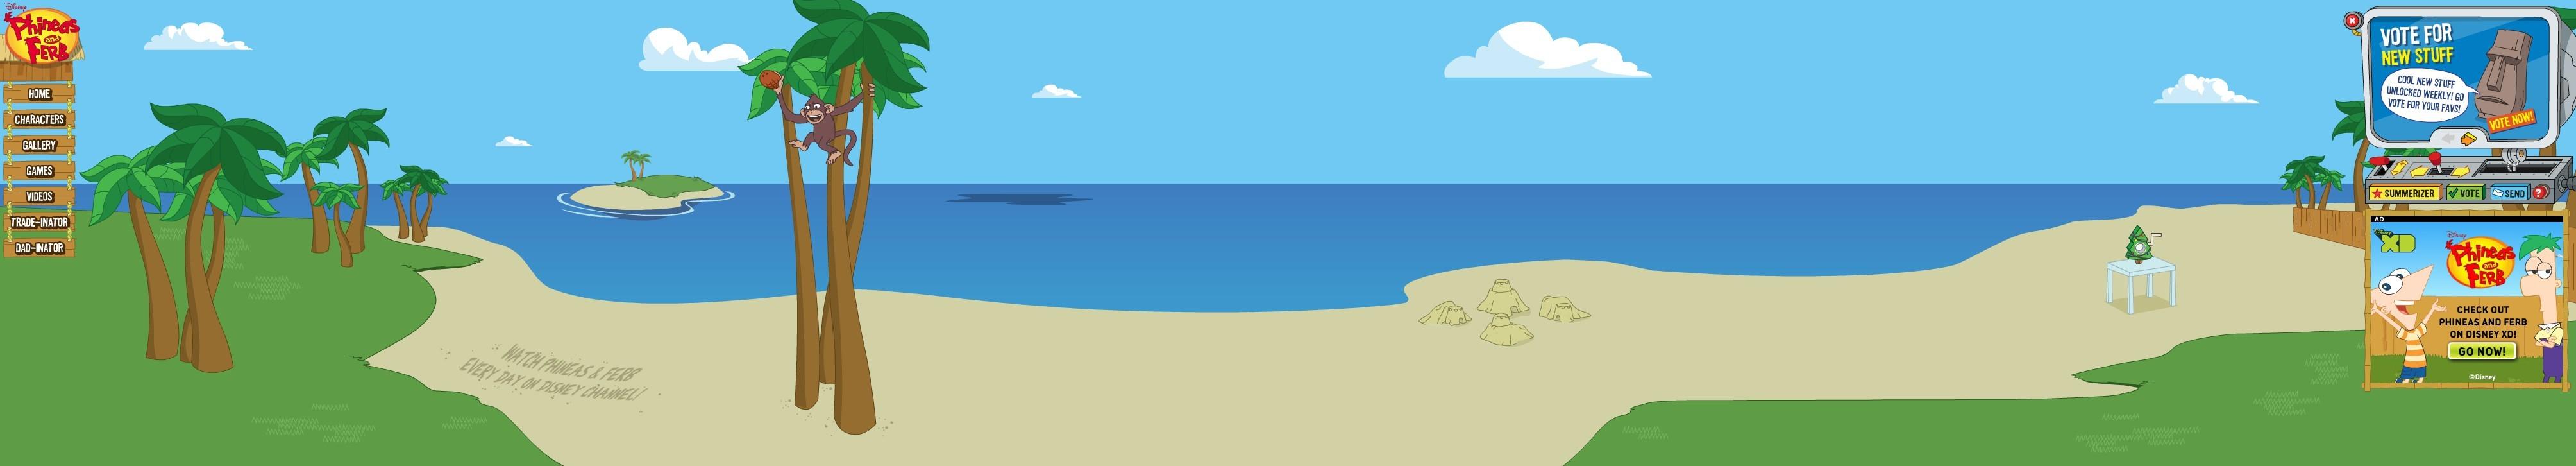 summer vacation summerizer phineas en ferb wiki